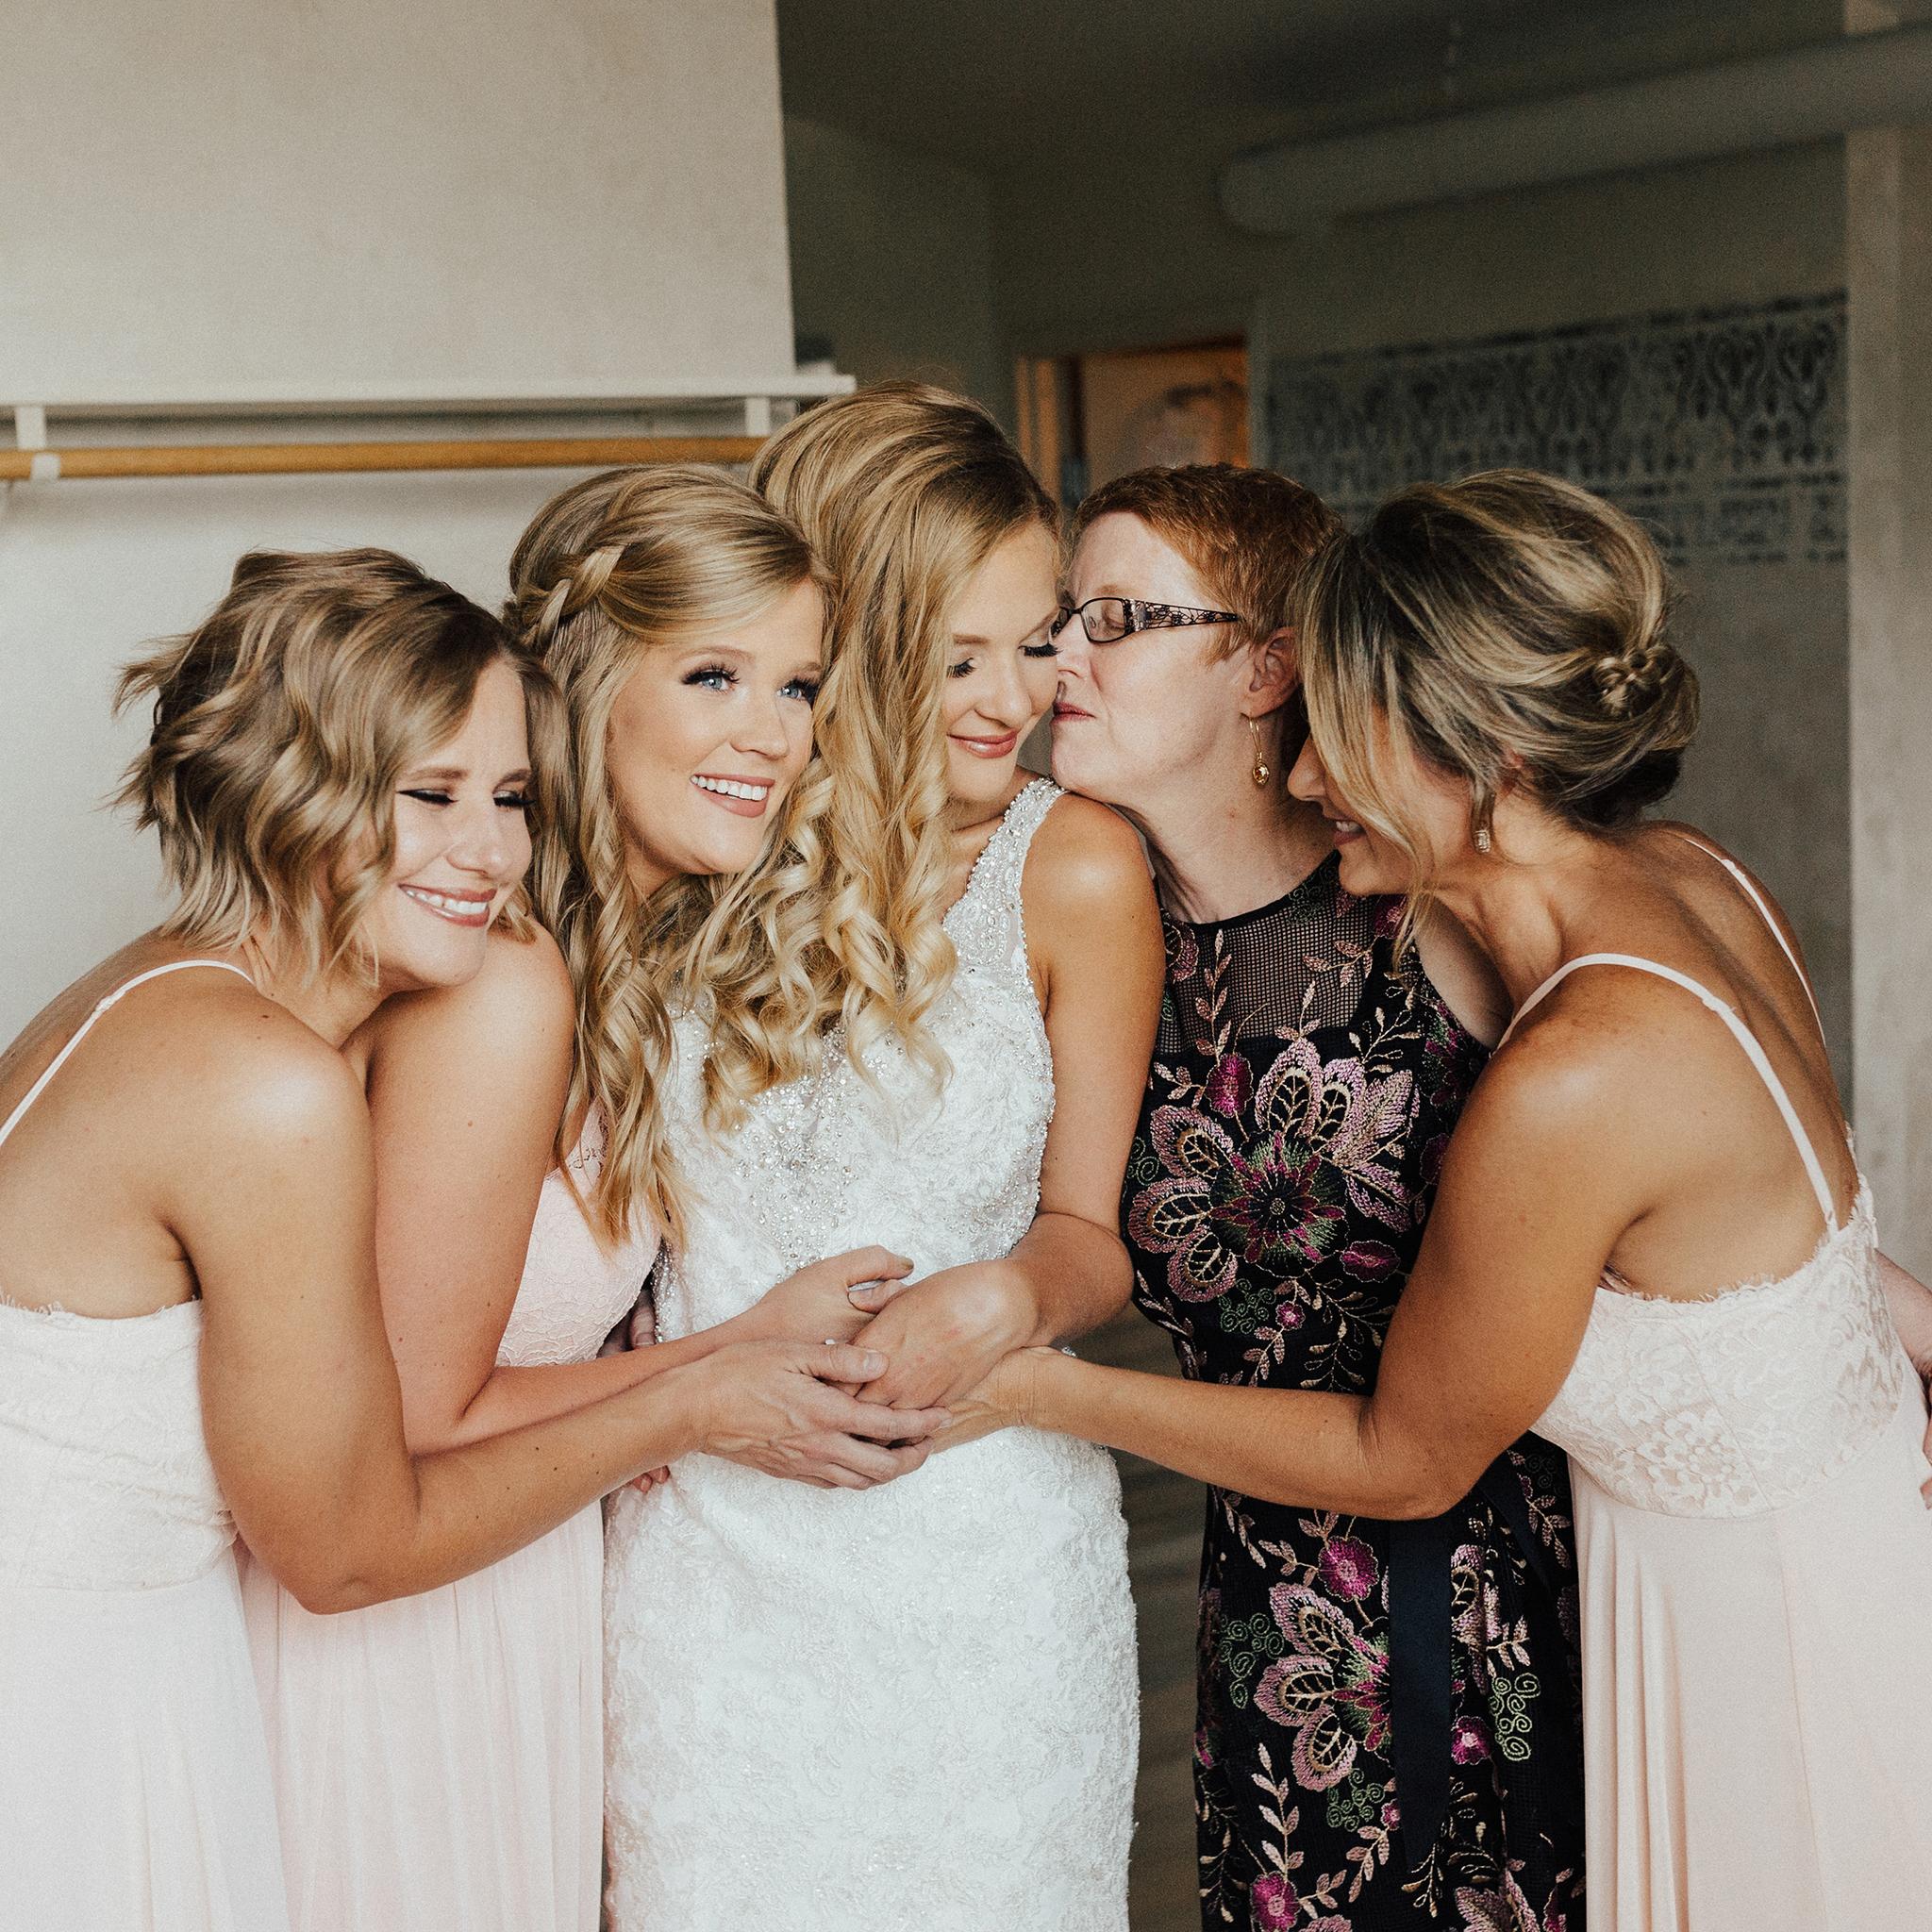 Arizona-Adventure-Elopement-Wedding-Photographer-43.jpg